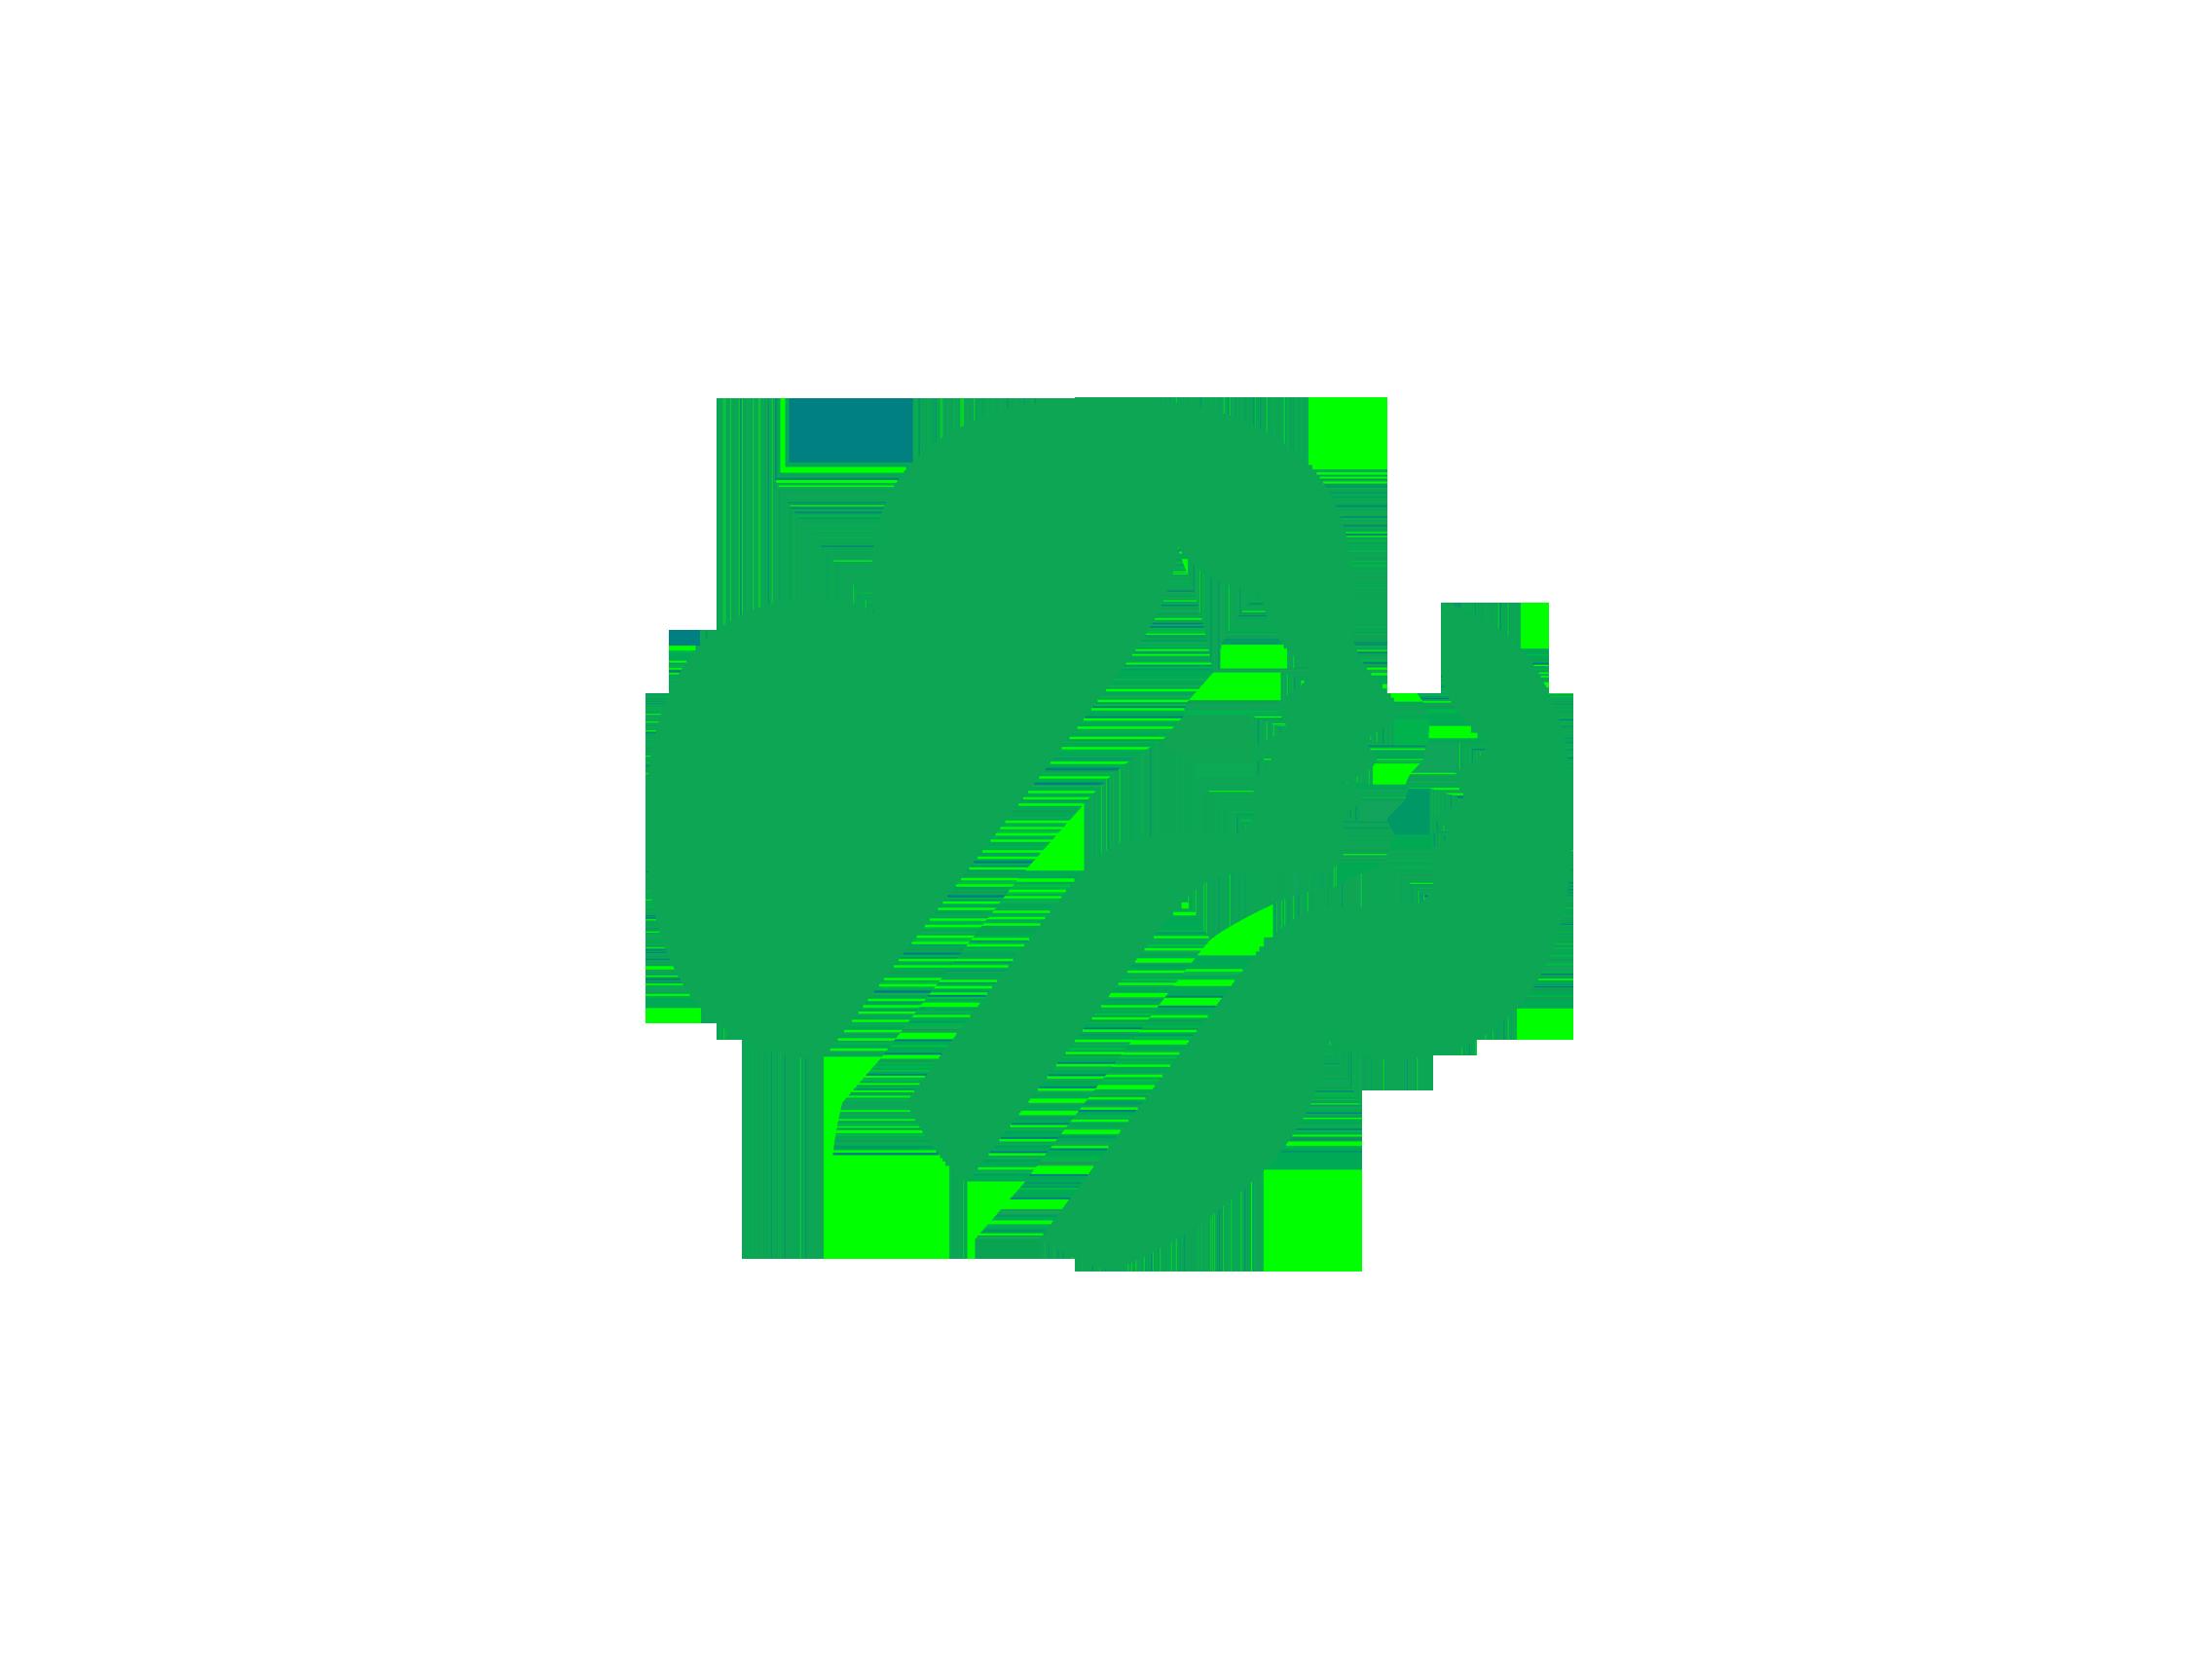 2272x1704 Girl Scouts Of The Usa Logo Logok